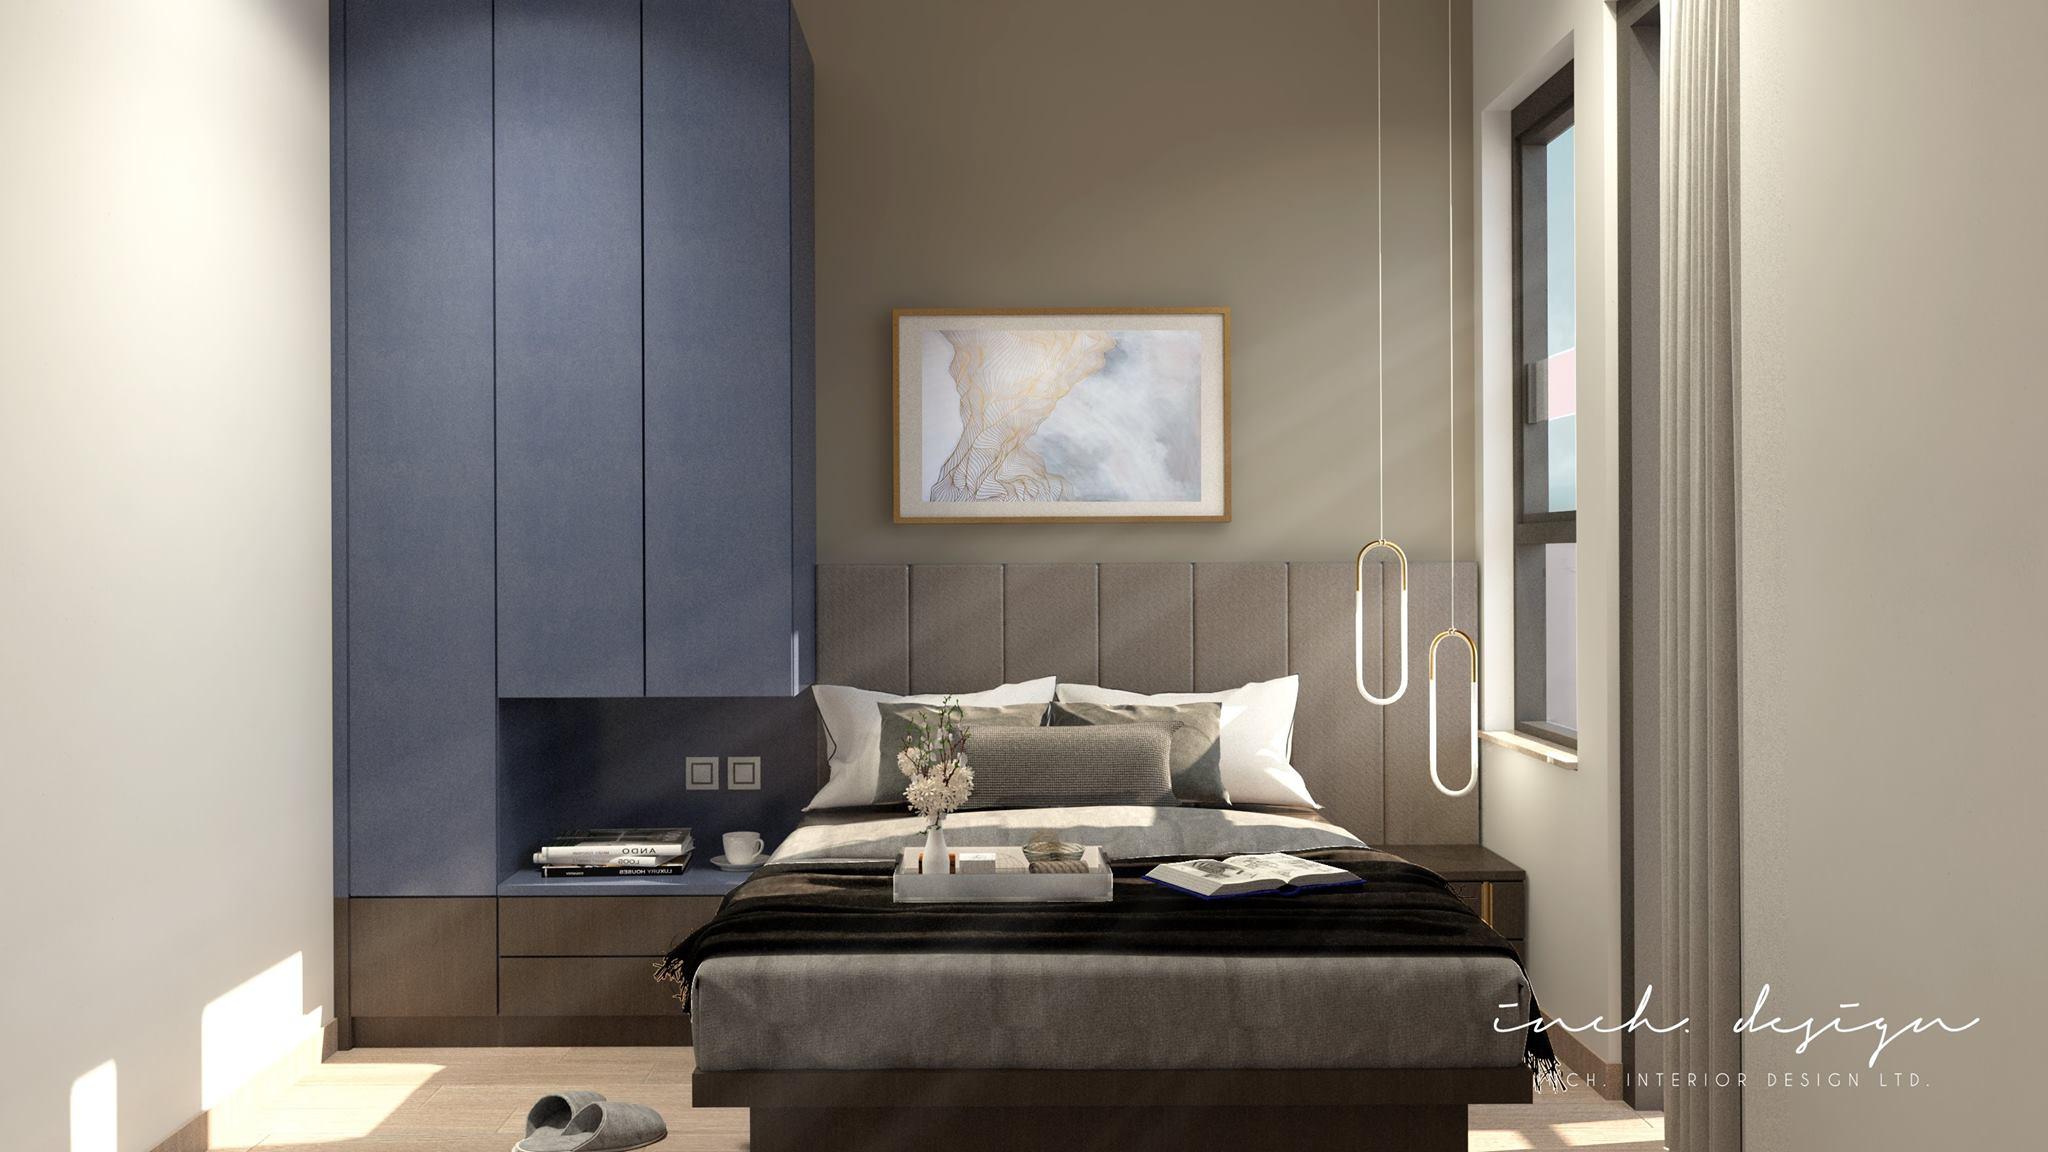 Inch Interior Design Victoria Skye Concept Image 003